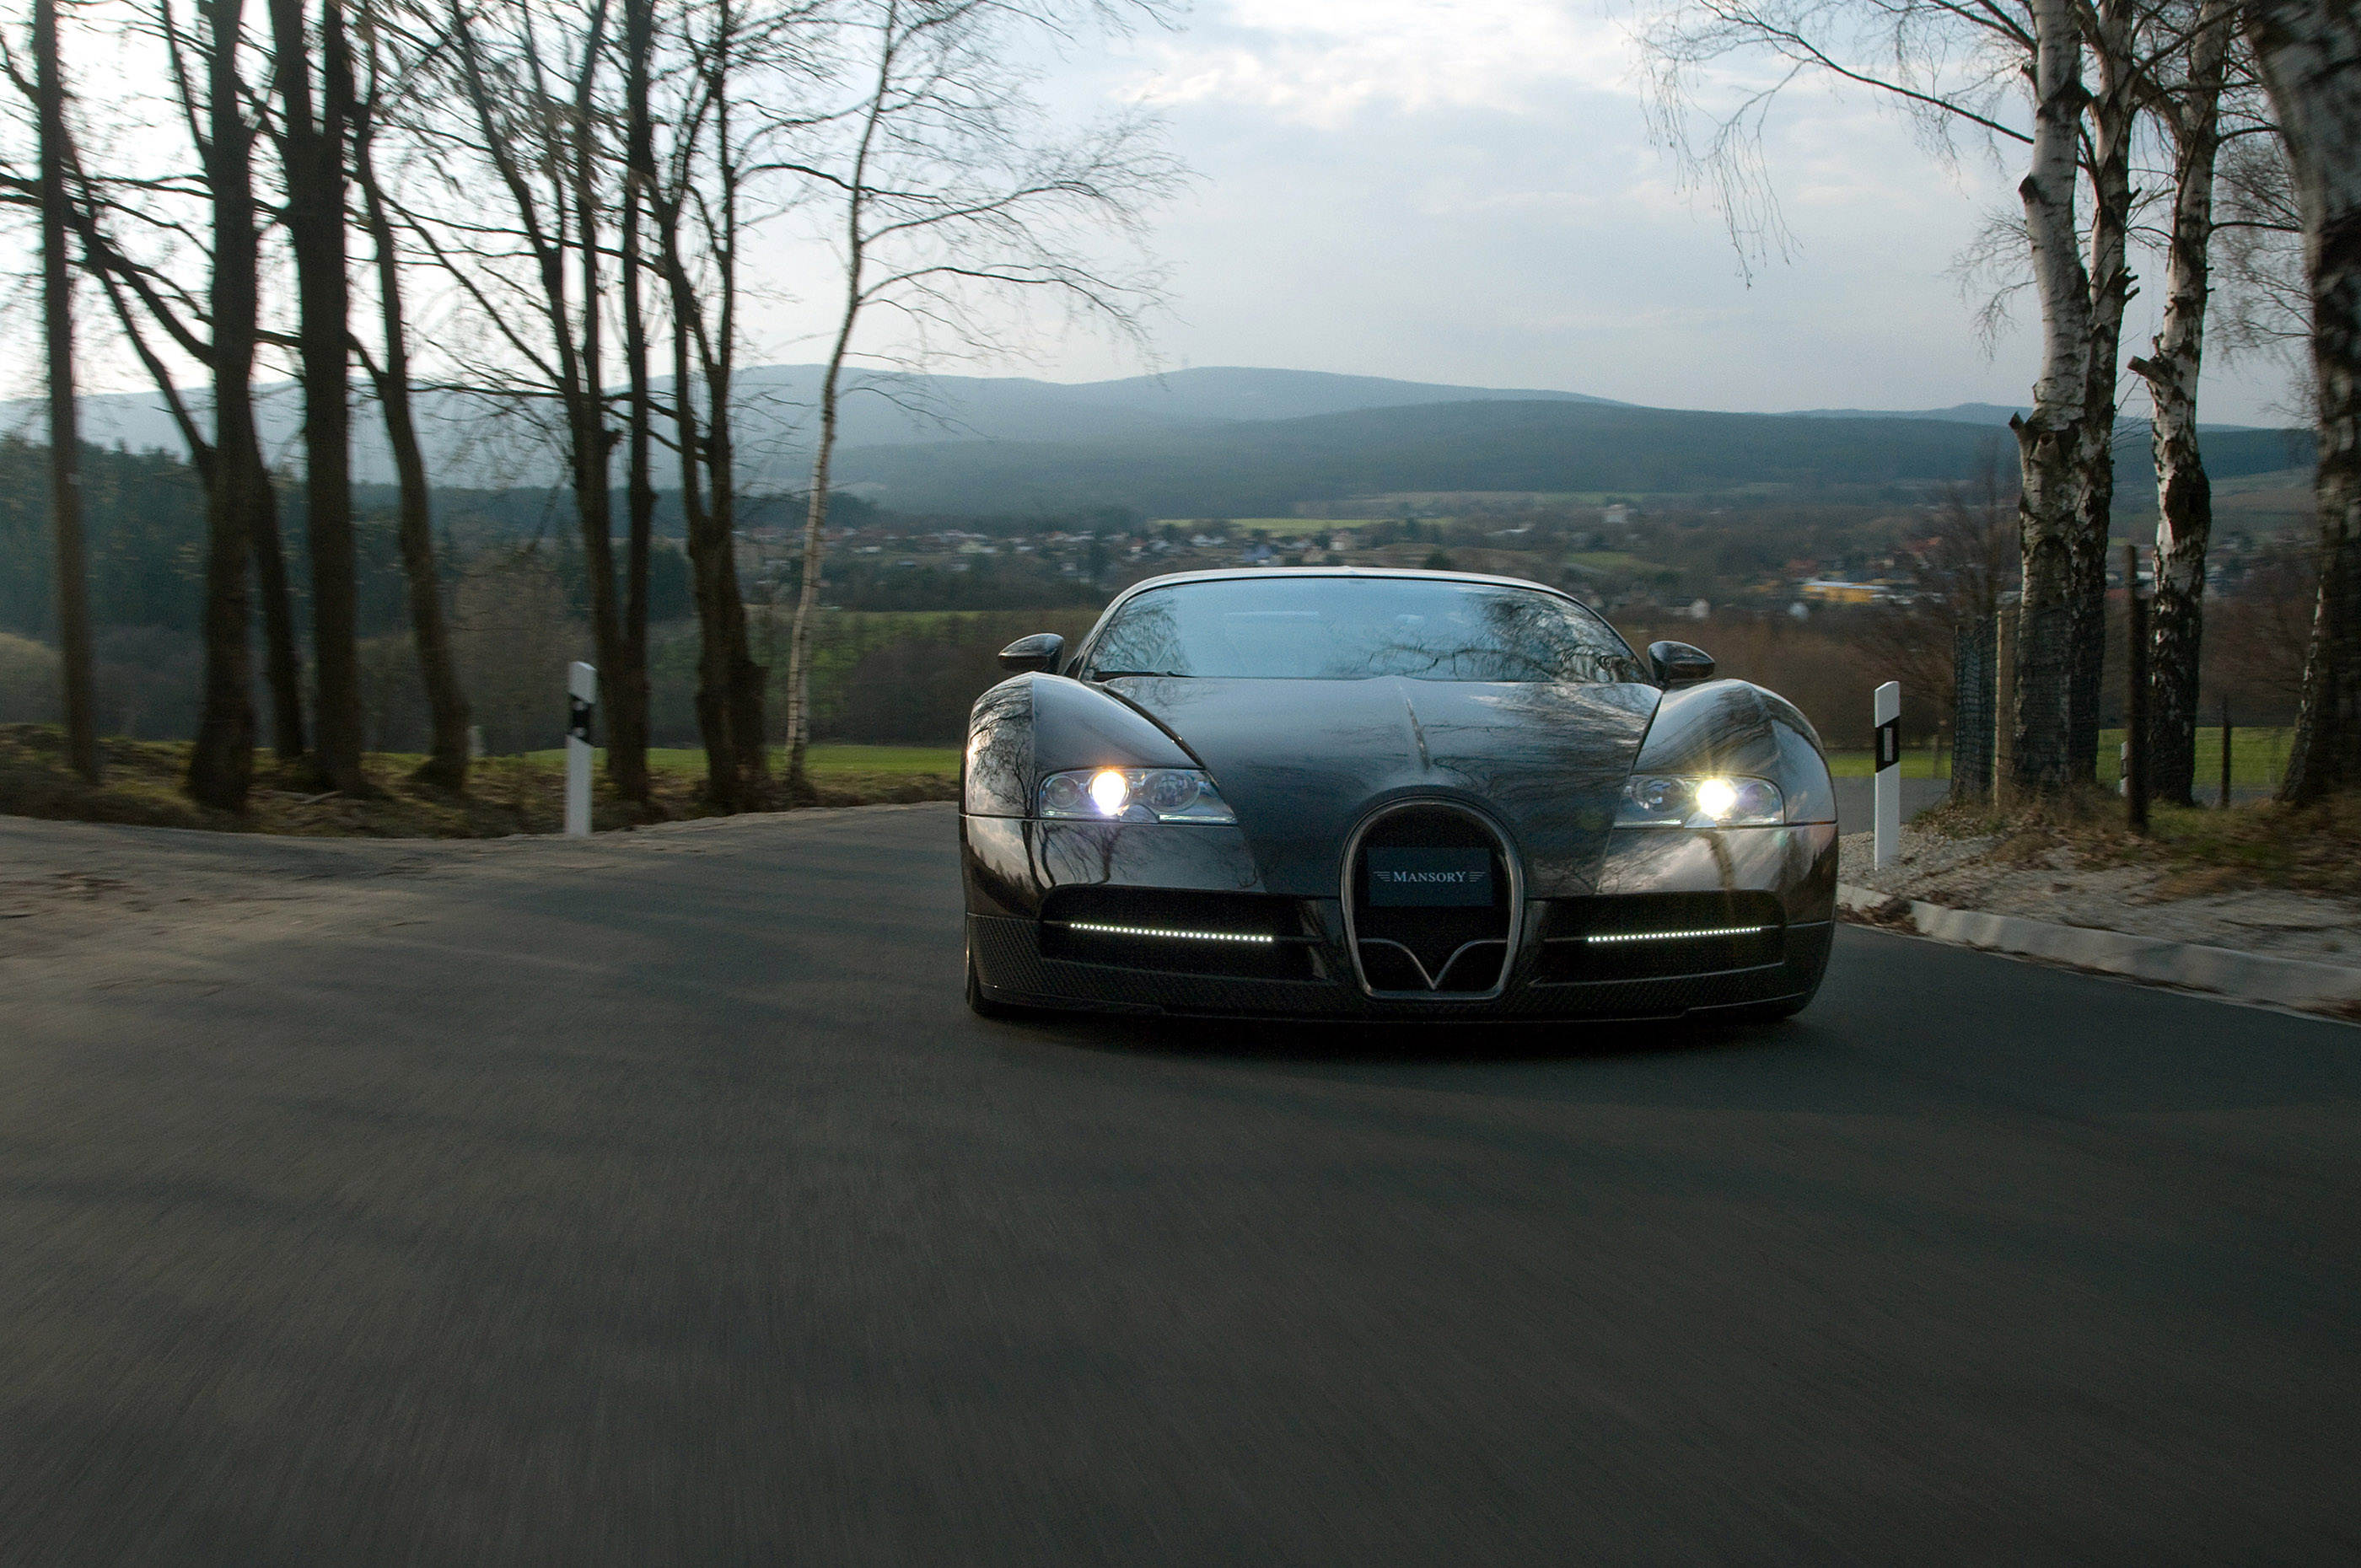 LINEA Vincero - Mansory уточняет Bugatti Veyron 16.4 - фотография №19